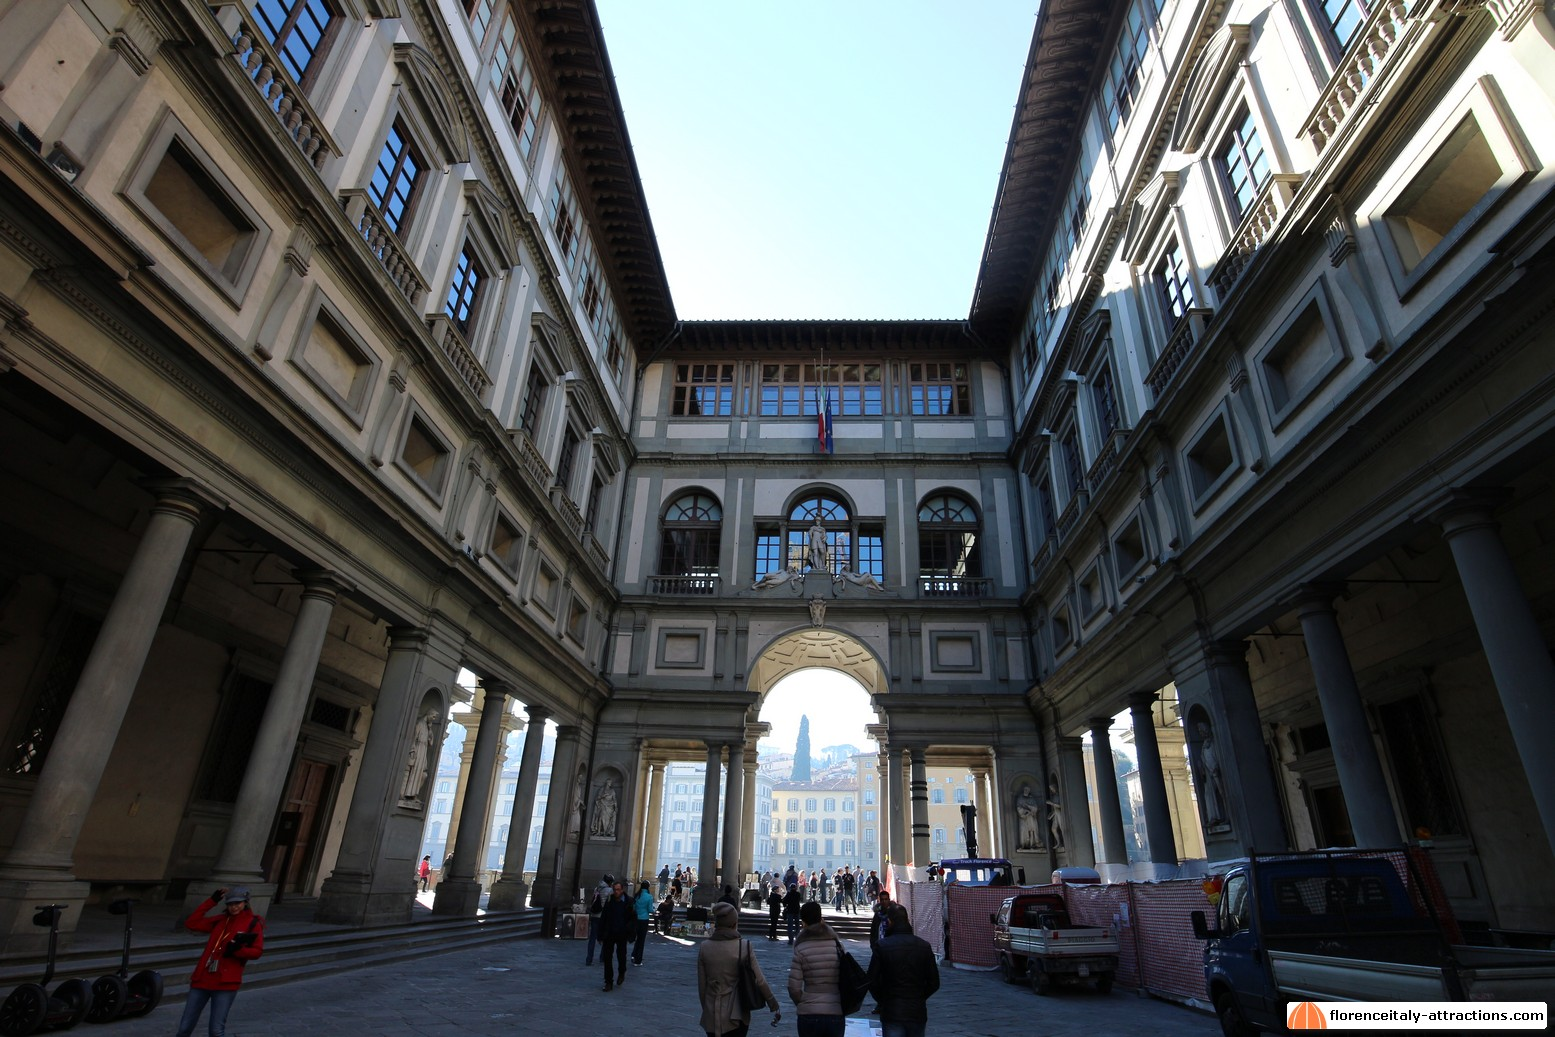 The Uffizi Gallery - Temple of the Renaissance